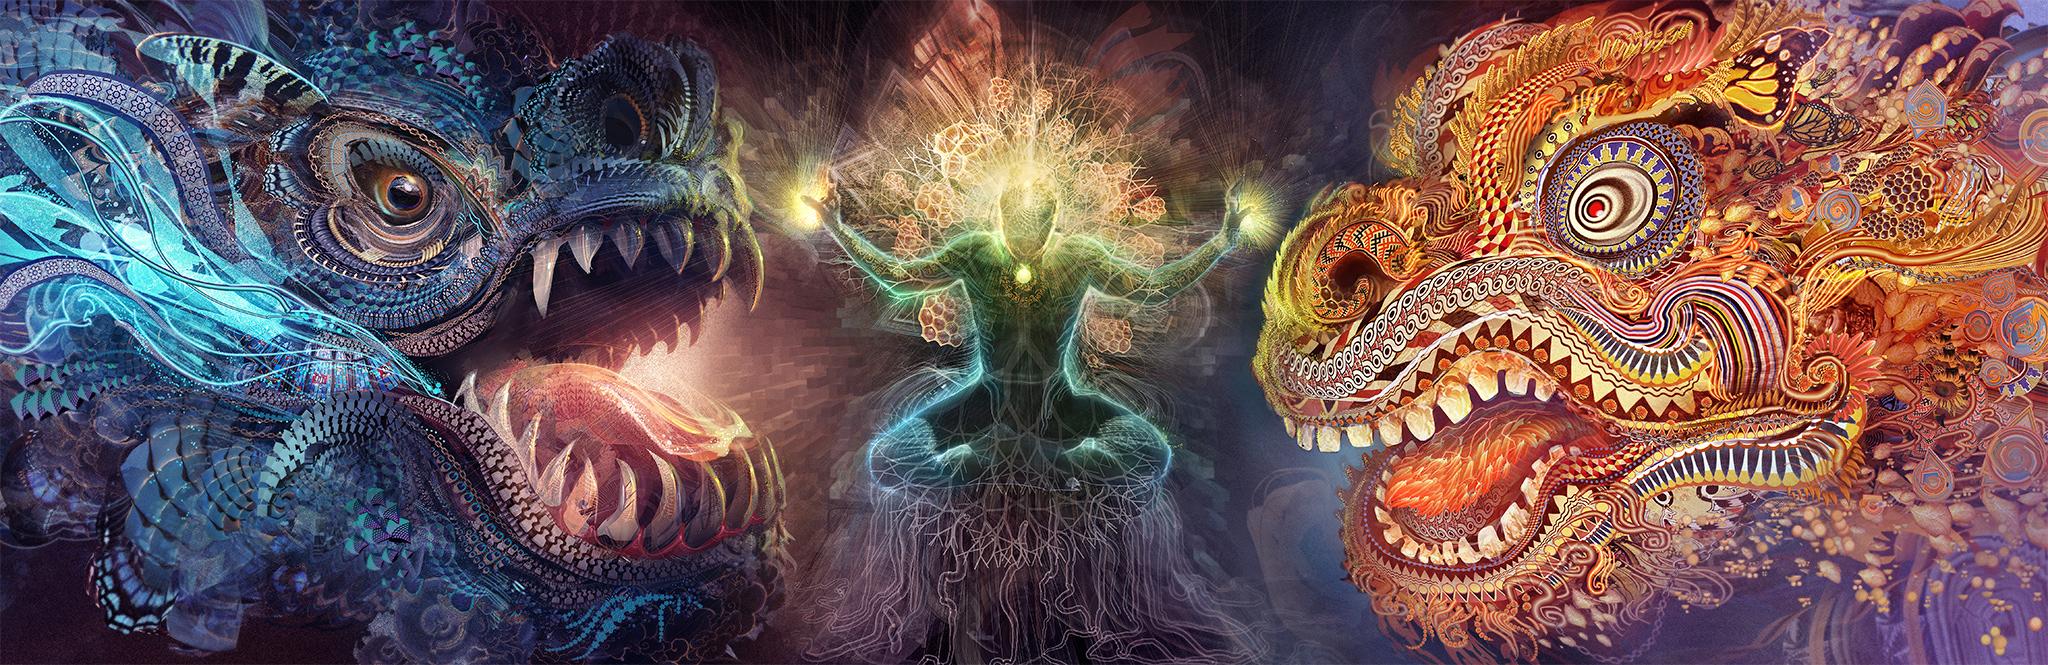 Harmony of Dragons